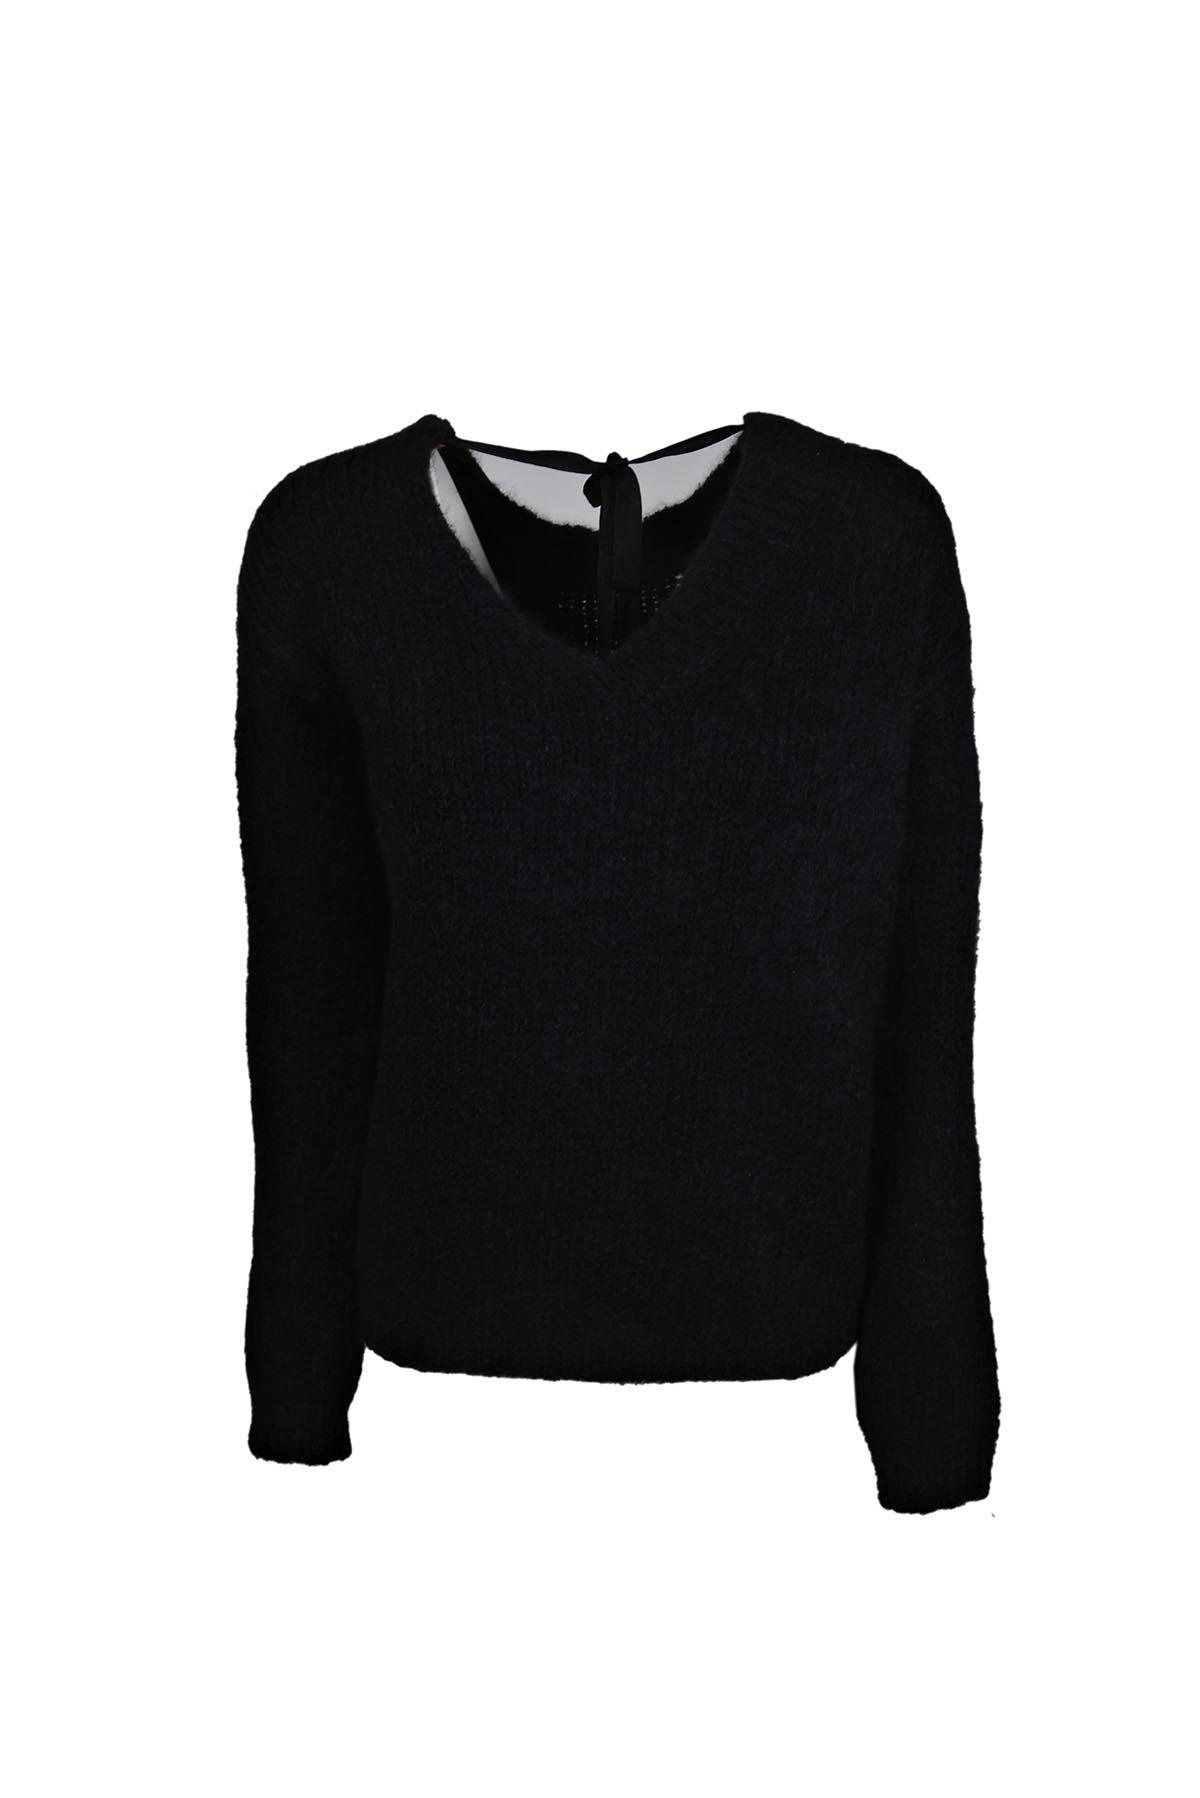 Forte Forte Open Back Sweater